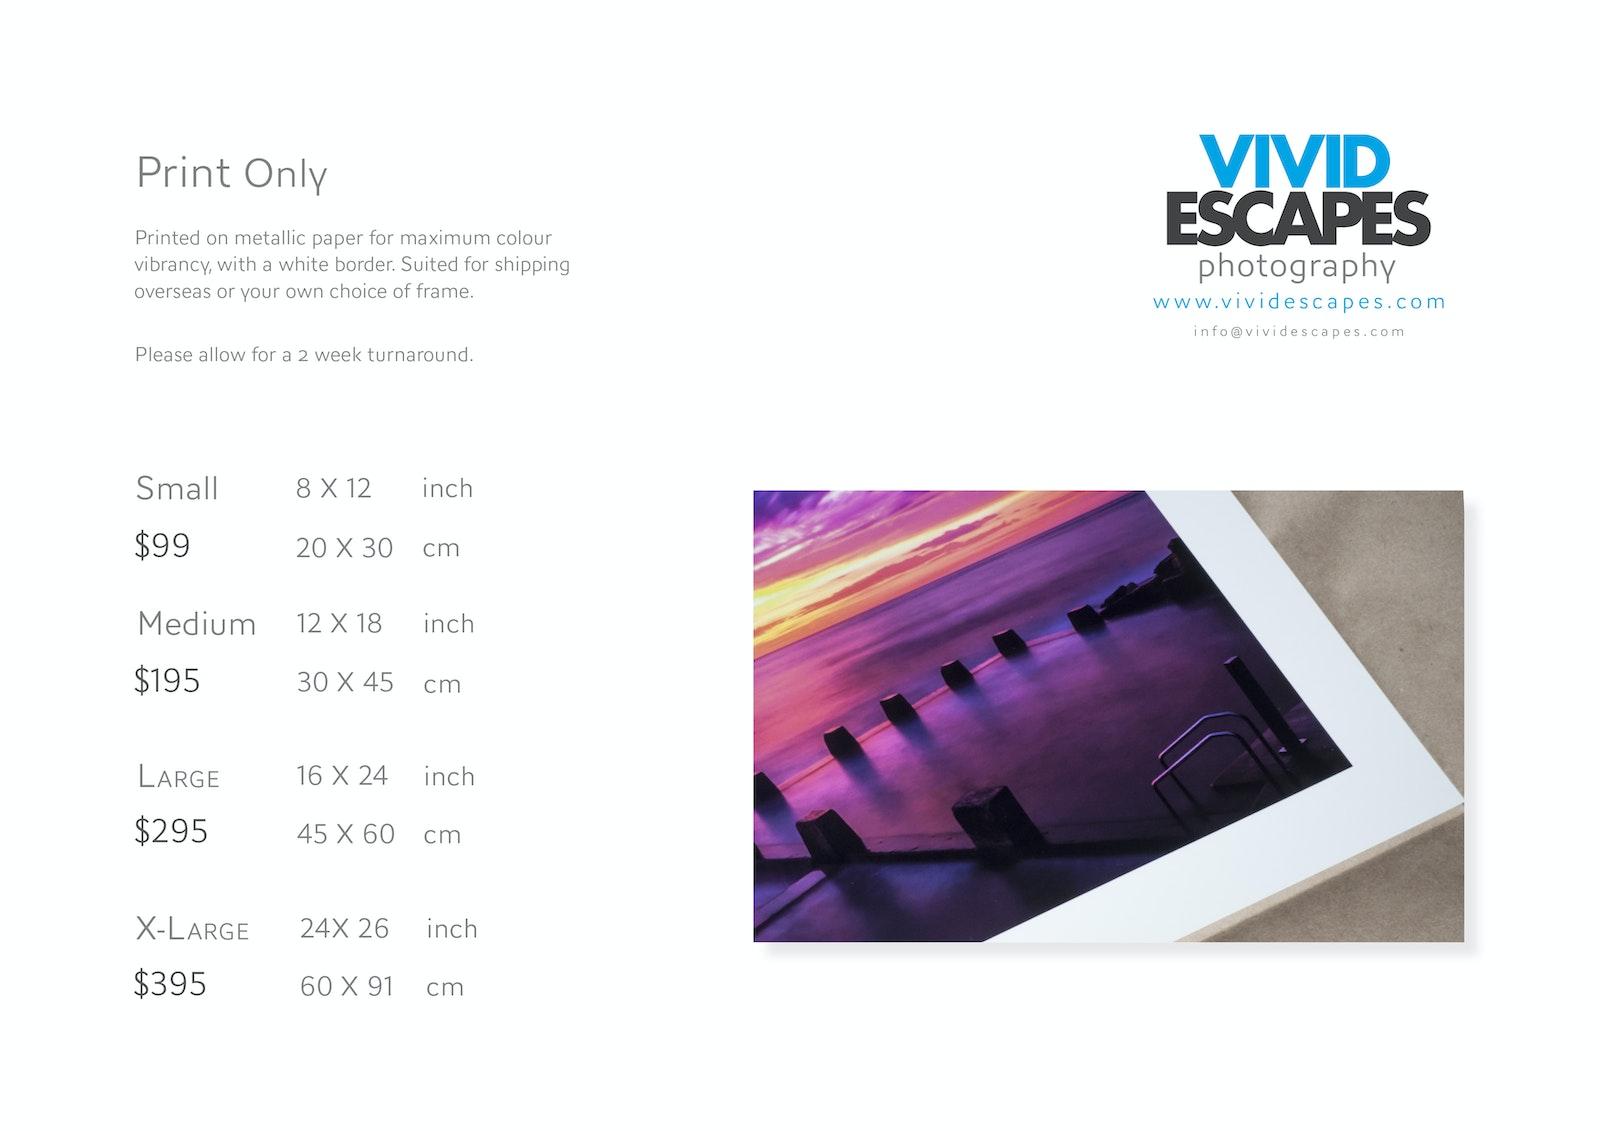 Vivid_Escapes_Price_List_NEW8